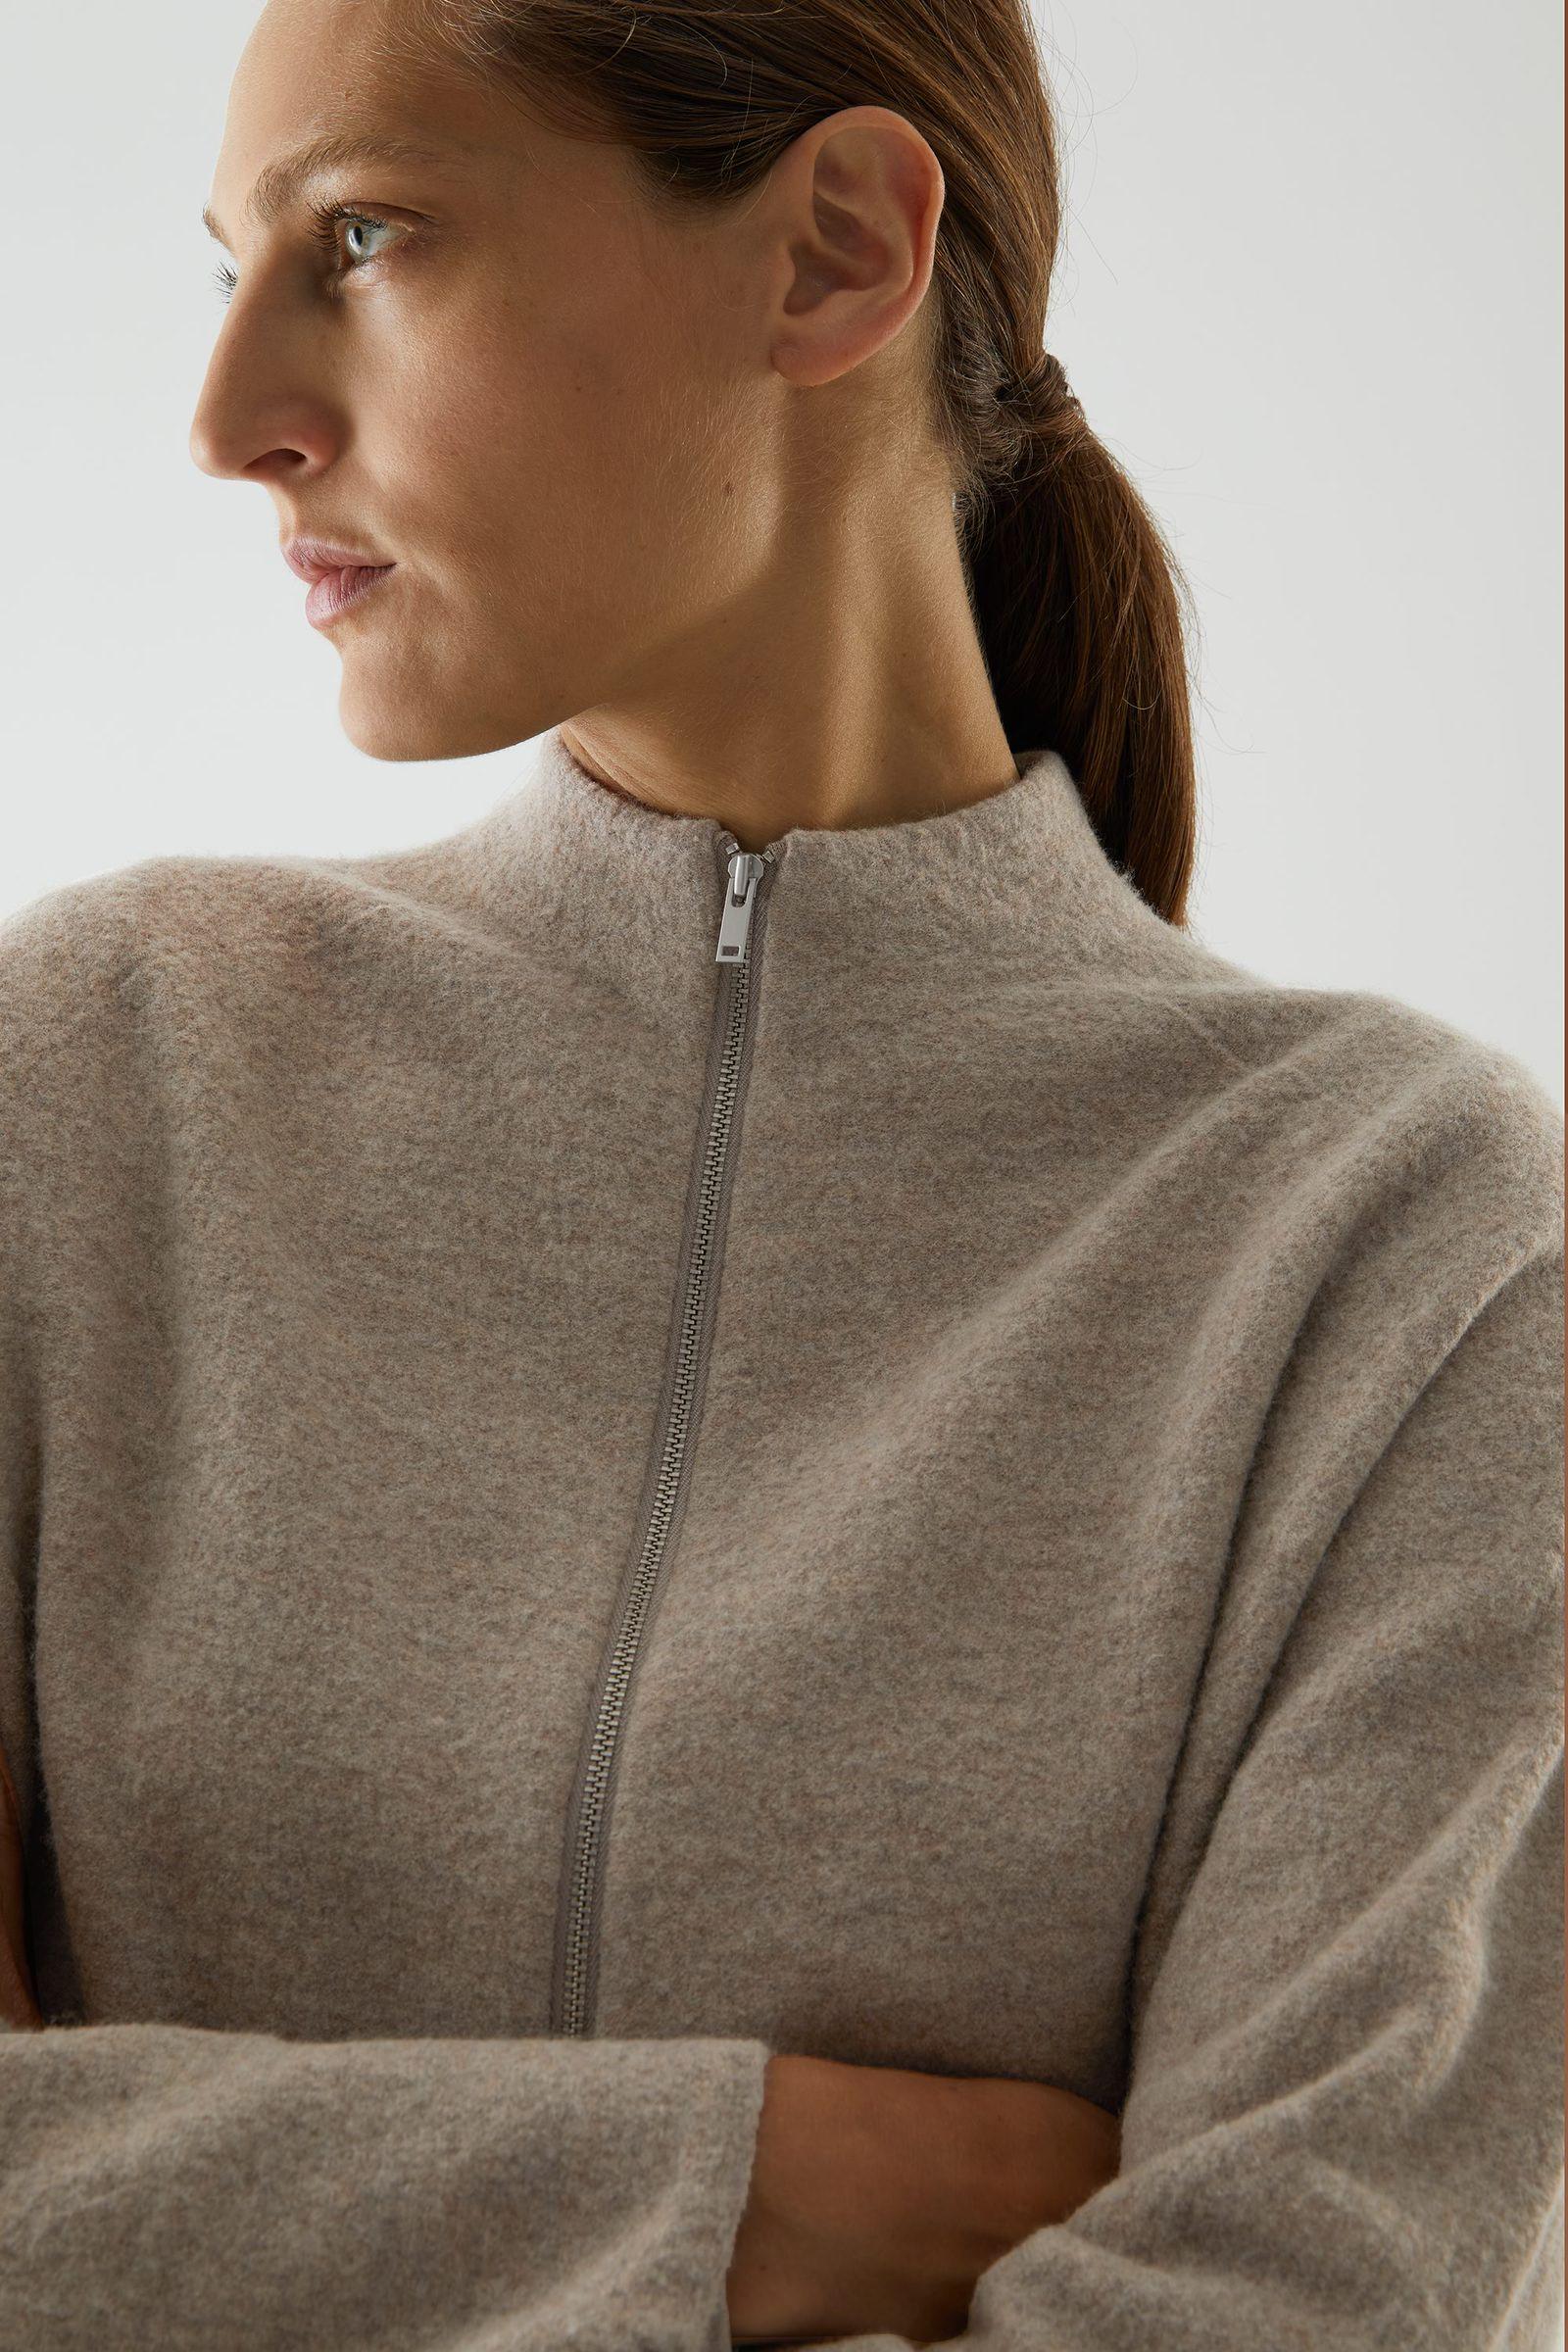 COS 메리노 울 롤넥 집업 재킷의 베이지컬러 ECOMLook입니다.